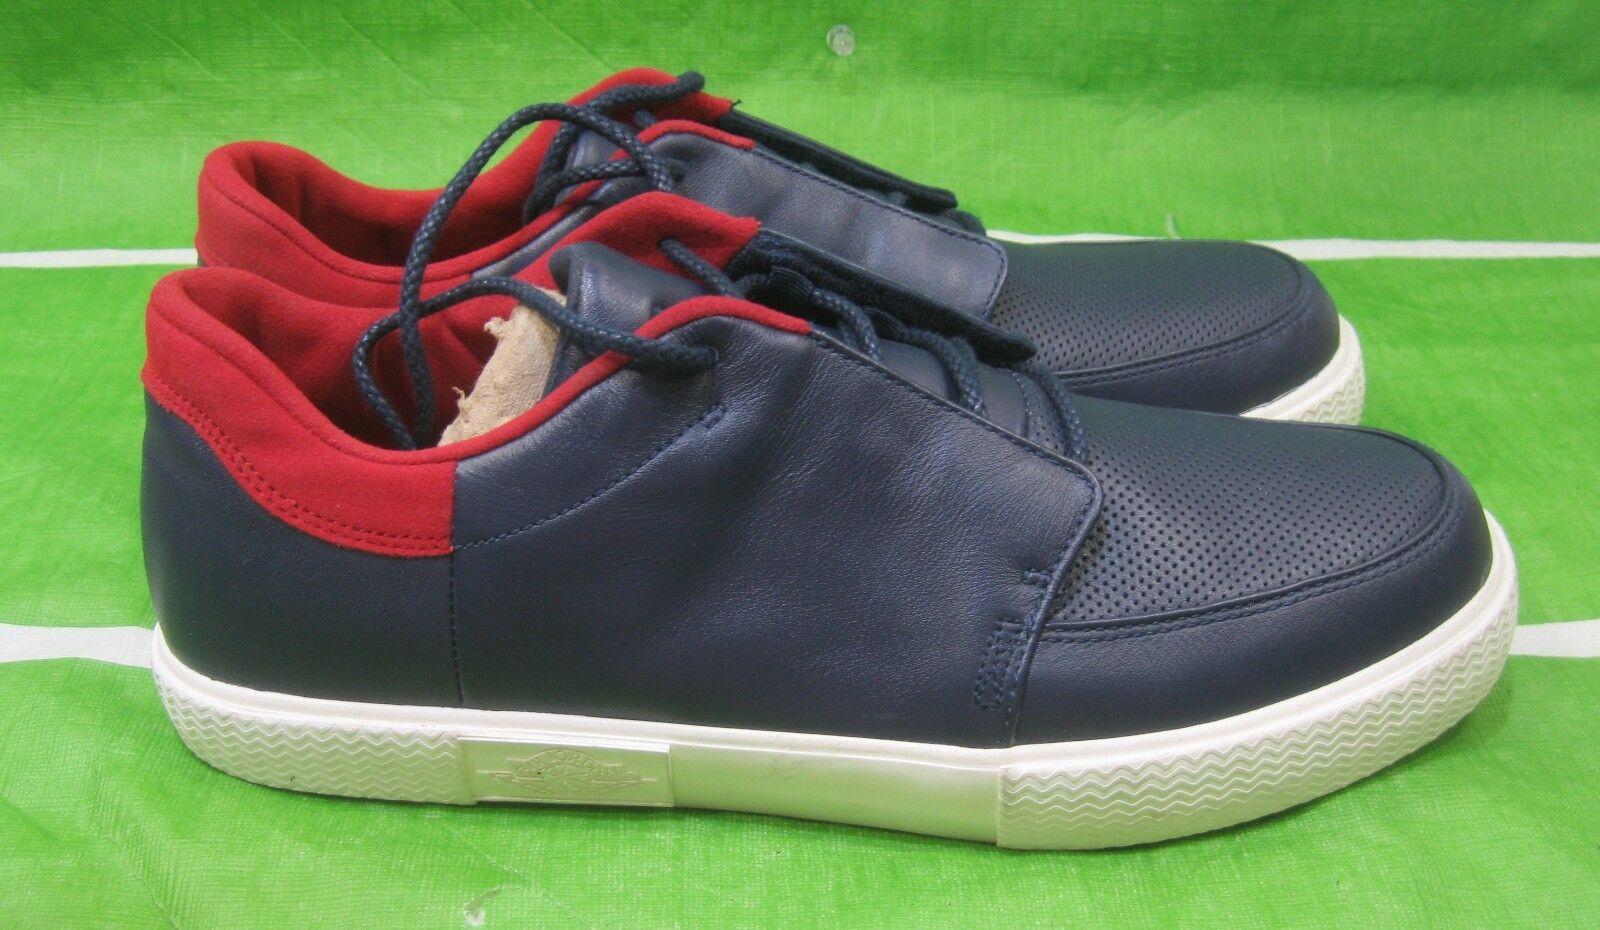 Jordan 428902 401 V.5 Grown Blue Red Mens Basketball Shoes Size 10-10.5